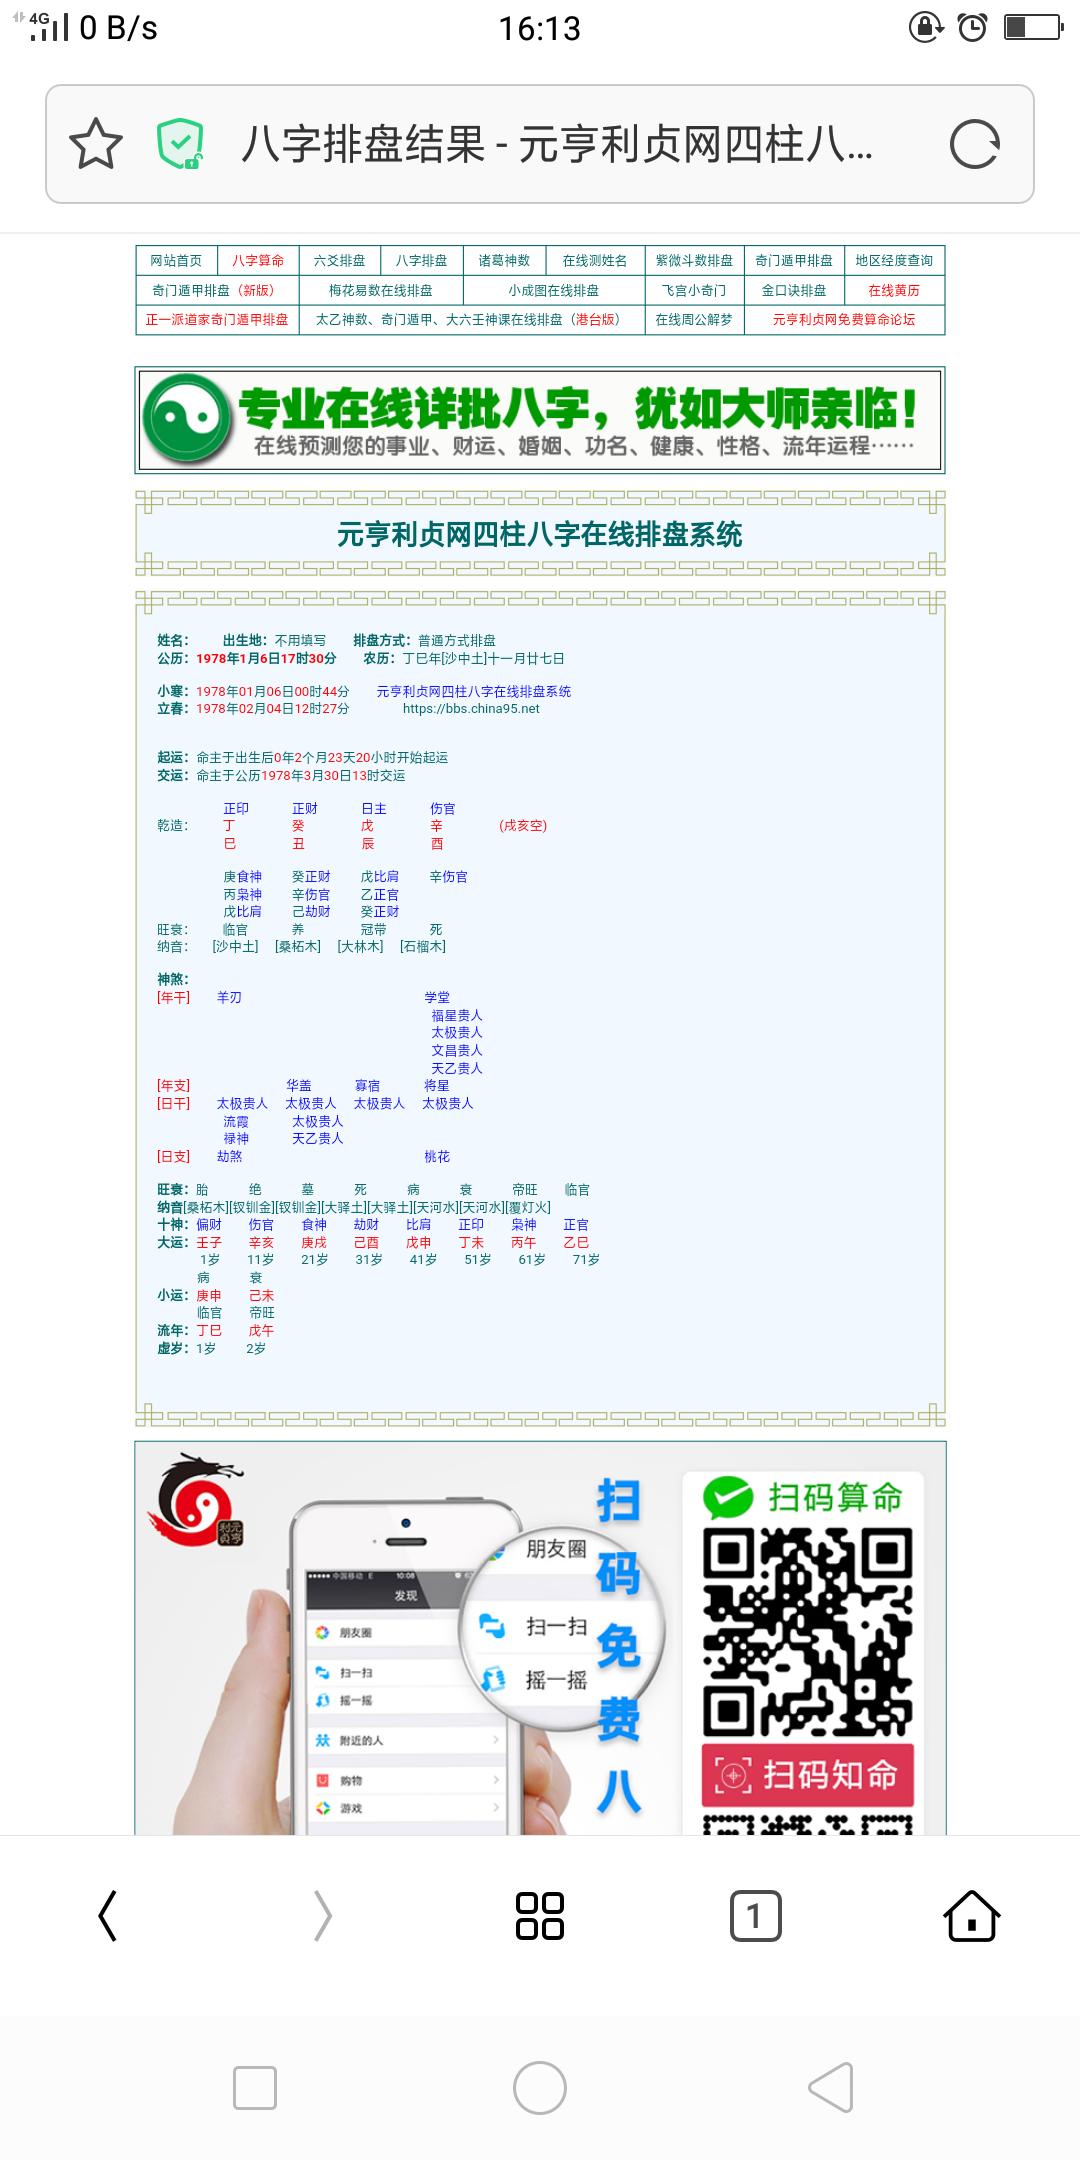 Screenshot_2020-05-11-16-13-37-18.png